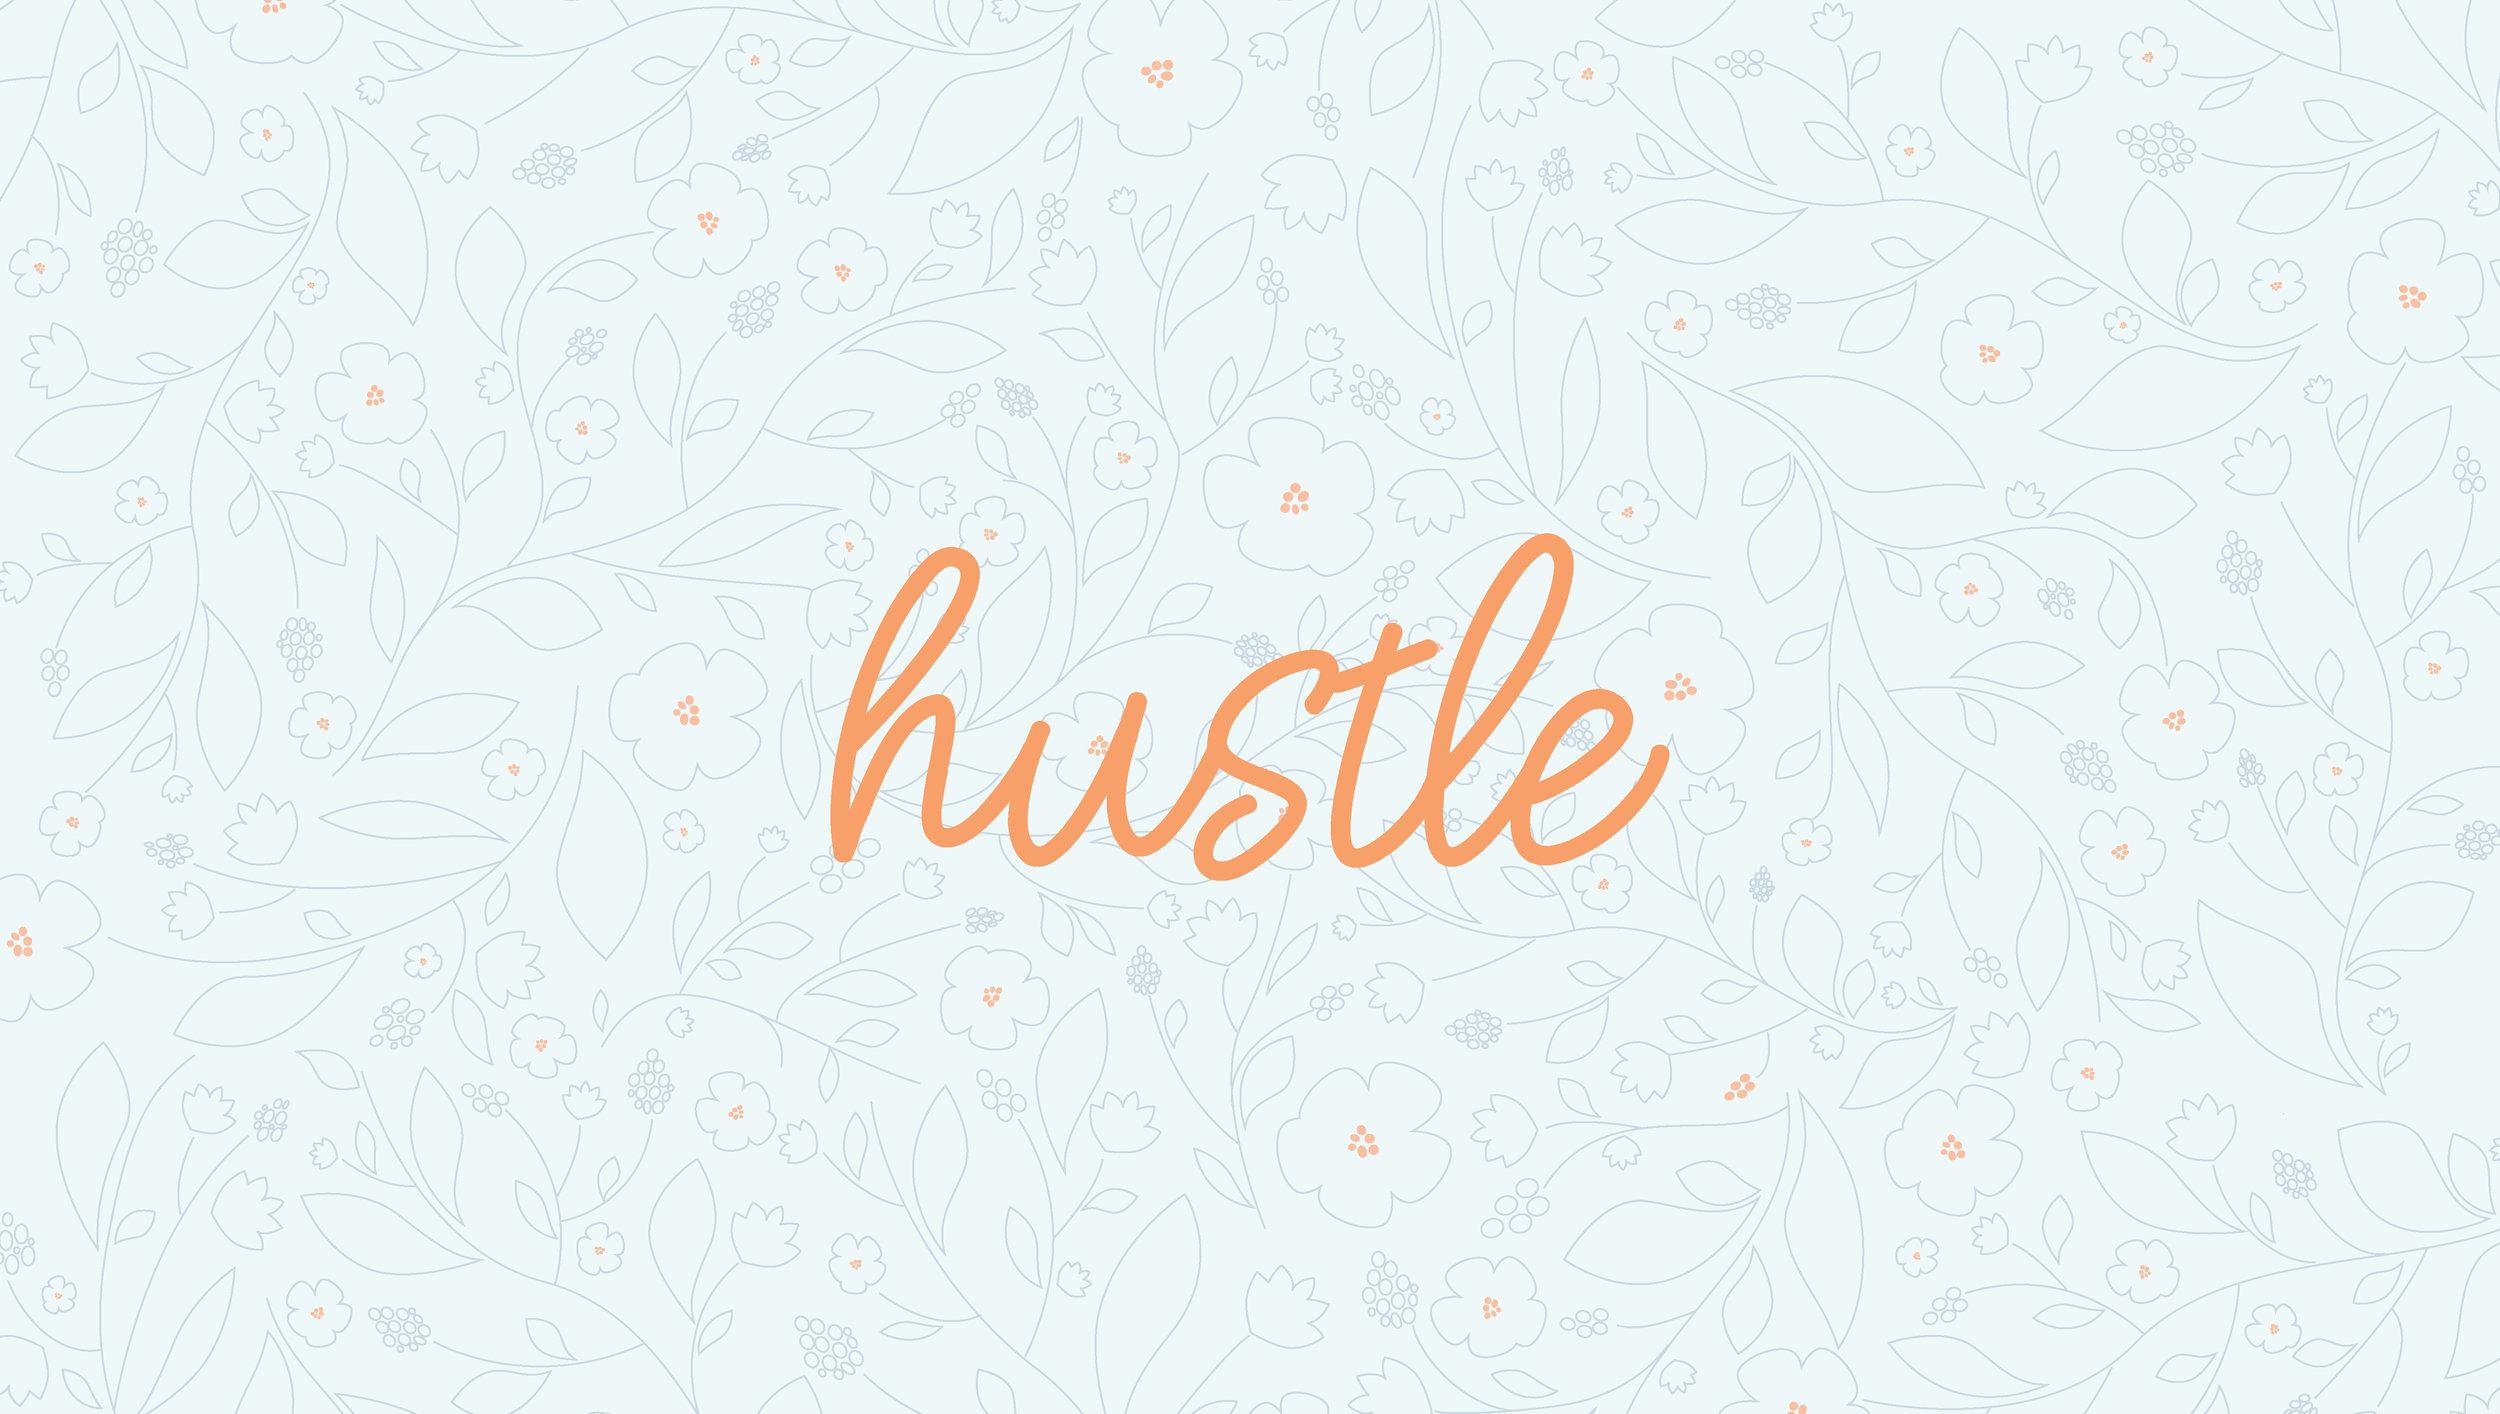 2017-july-freebies-hustle_LitoSupplyCo.jpg